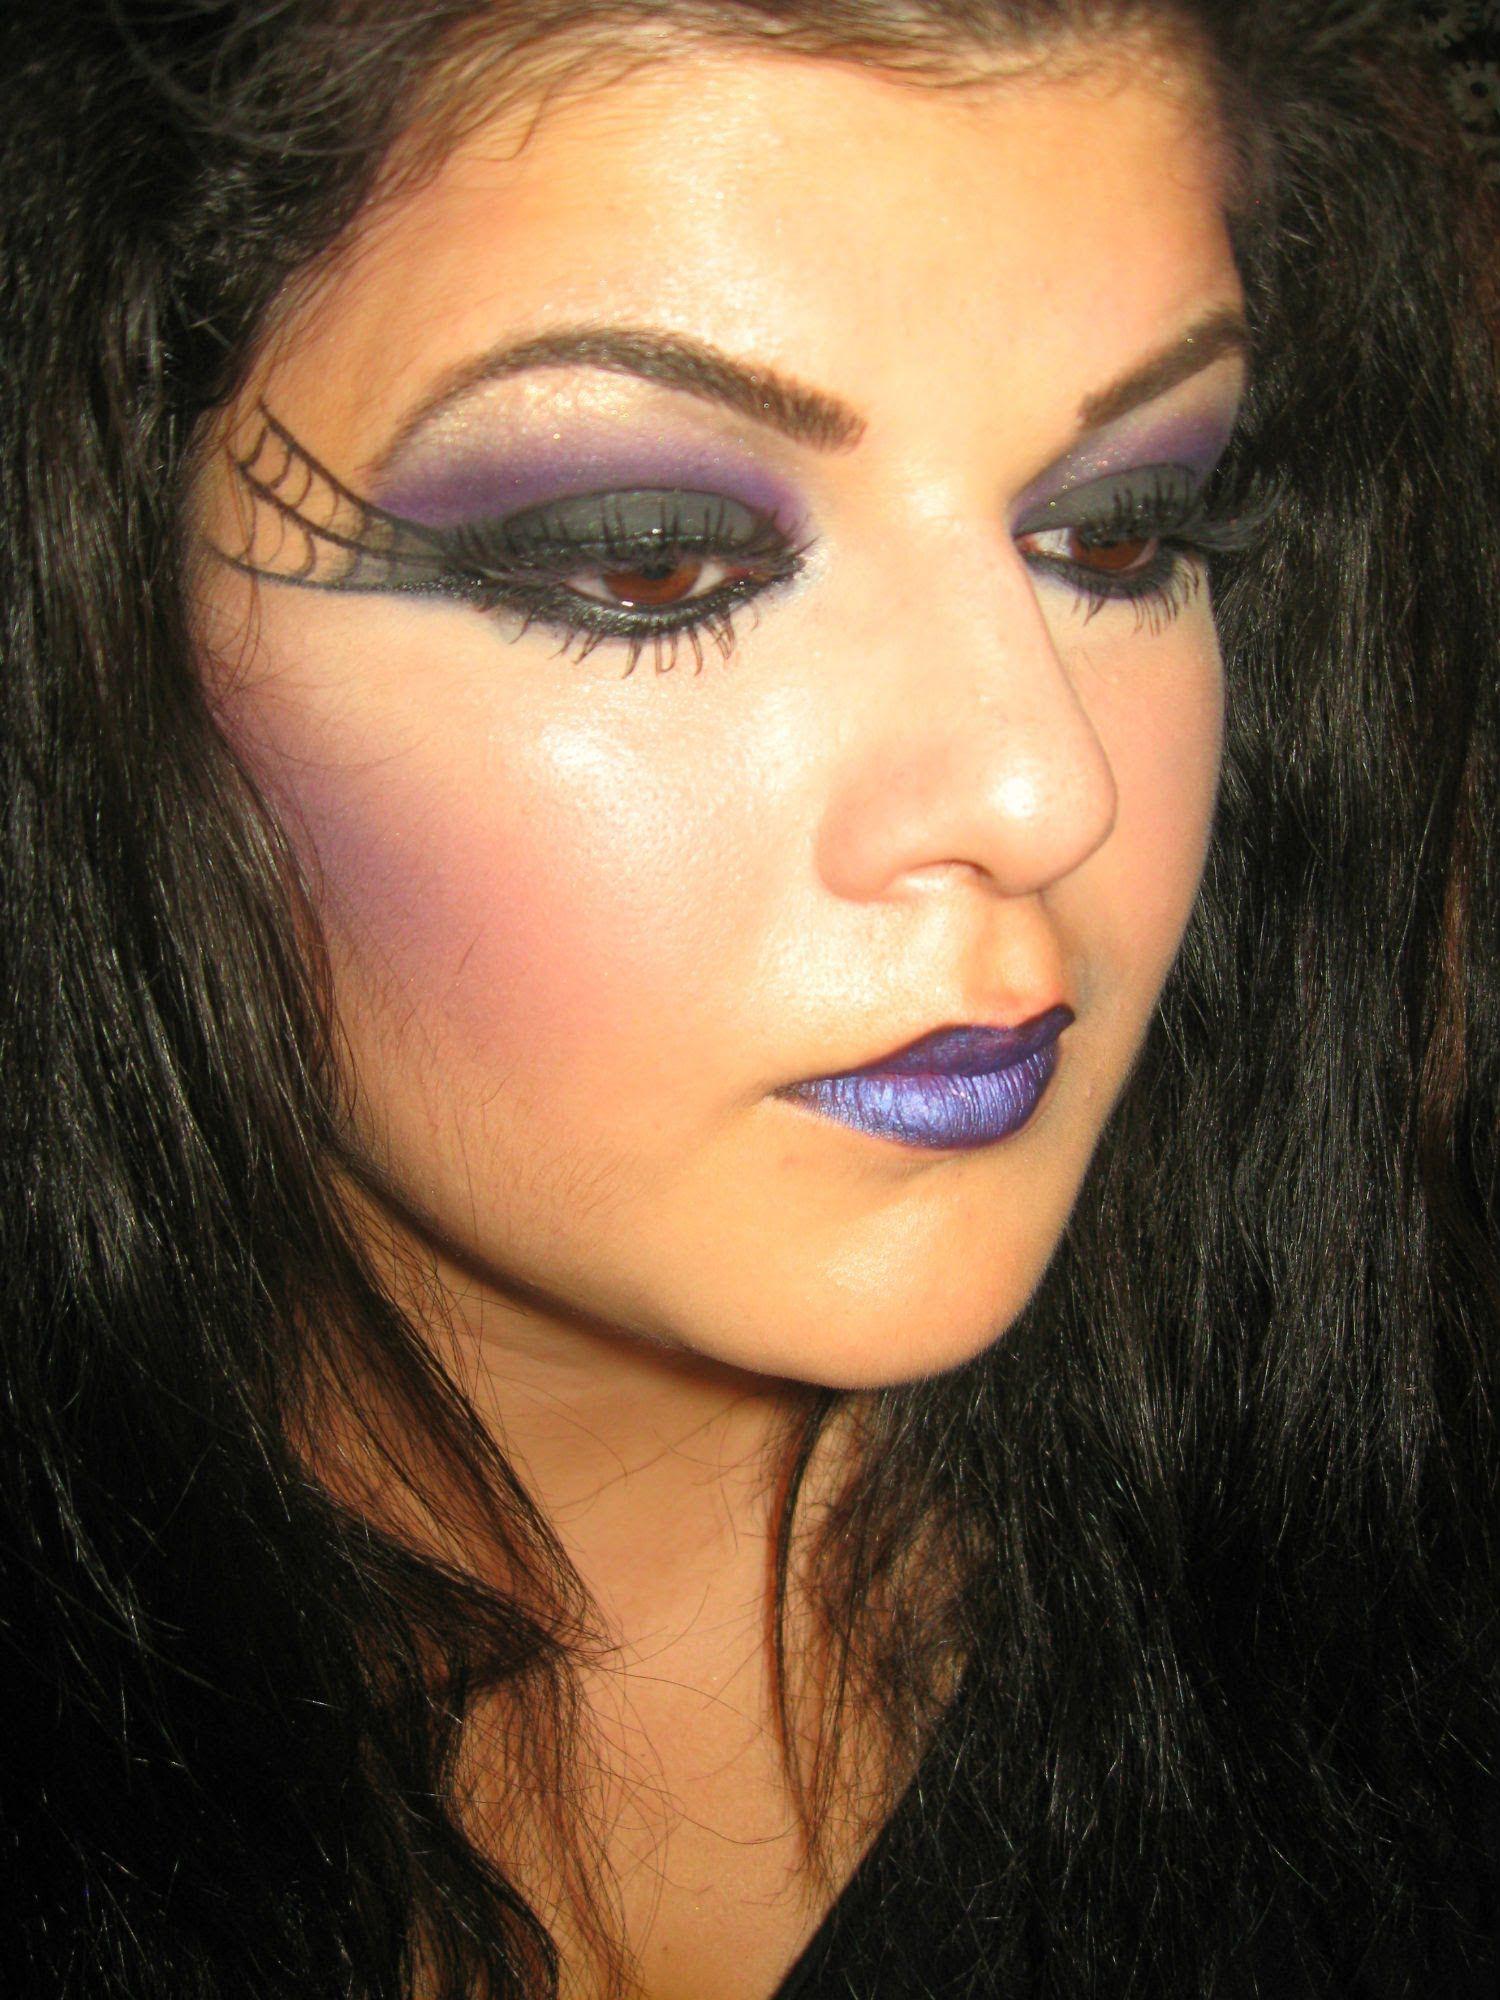 Witch Halloween Makeup Ideas Halloween makeup for kids